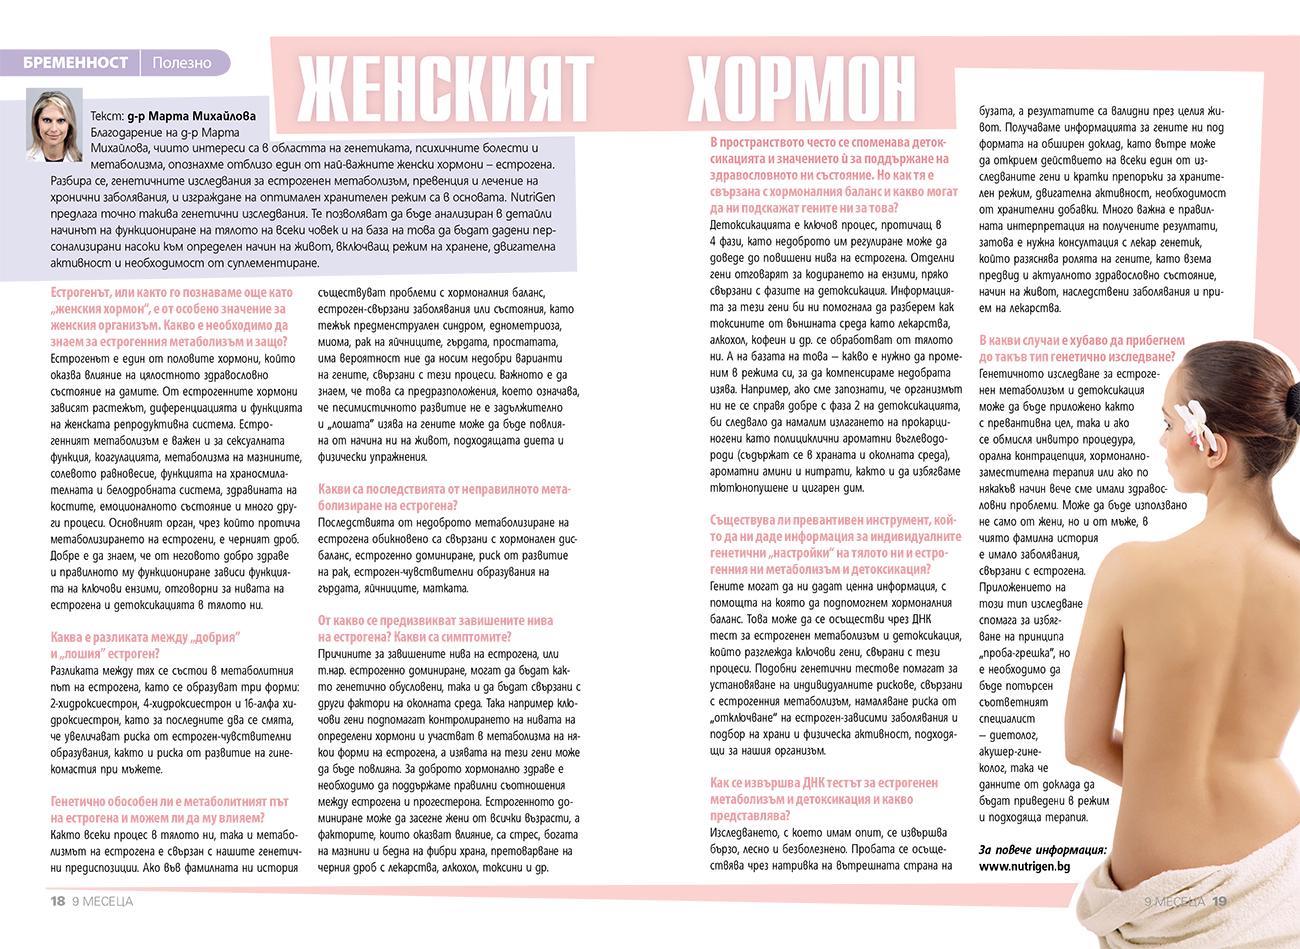 "NutriGen в сп ""9 месеца"", март 2017г."